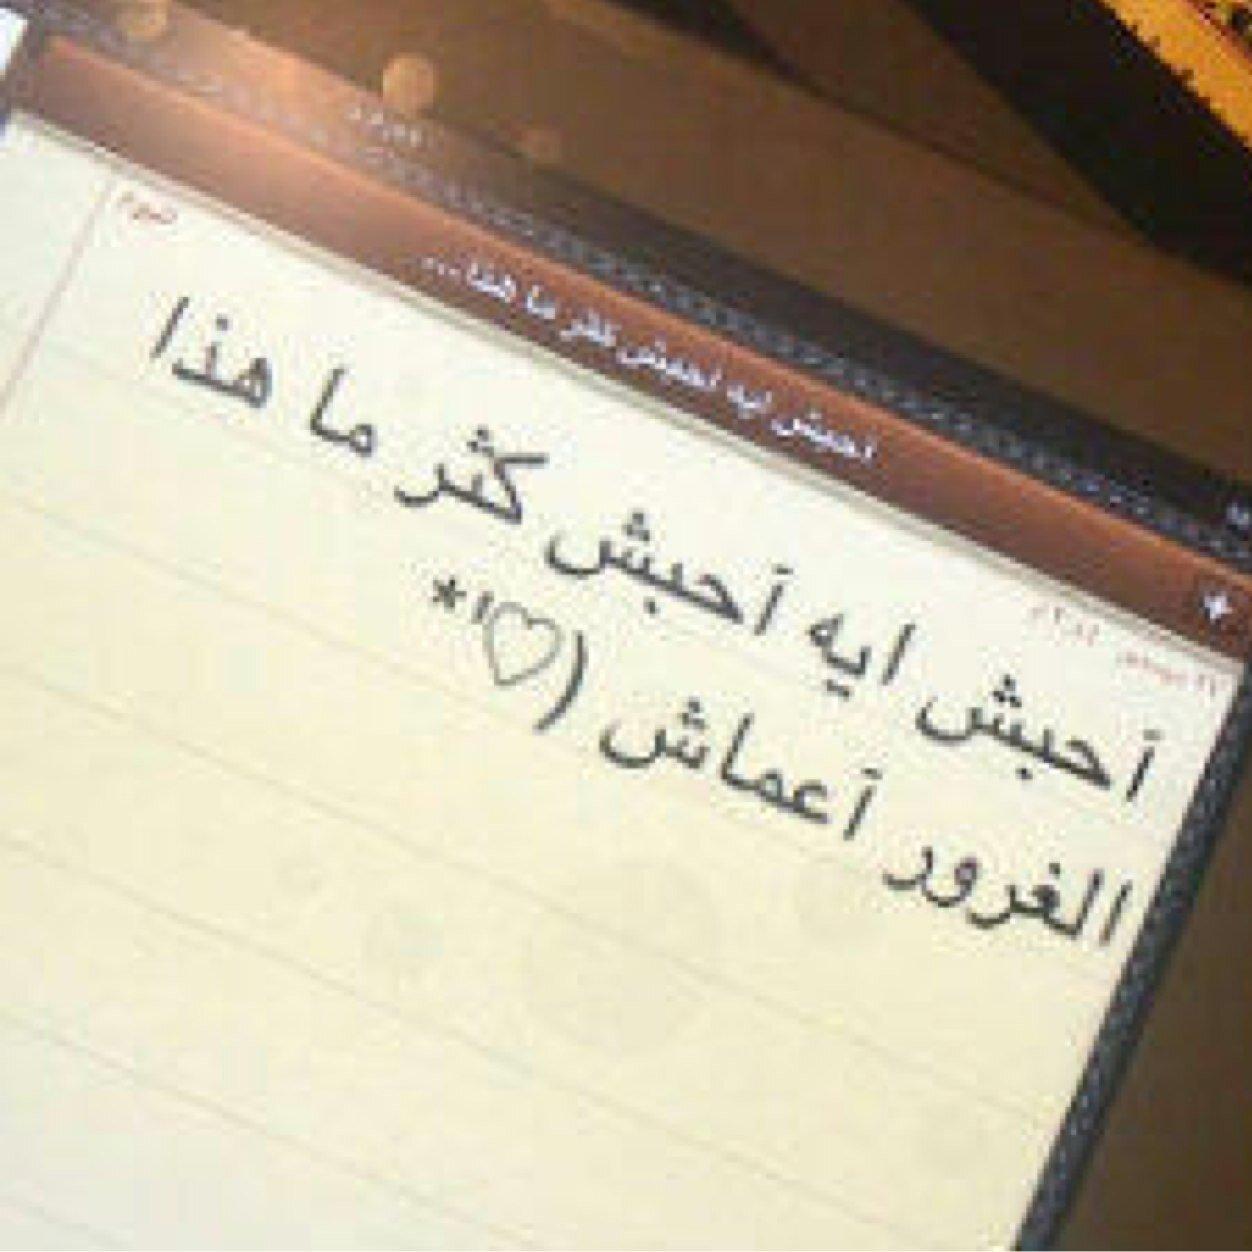 ابيات بدوي Nayf97q8 Twitter